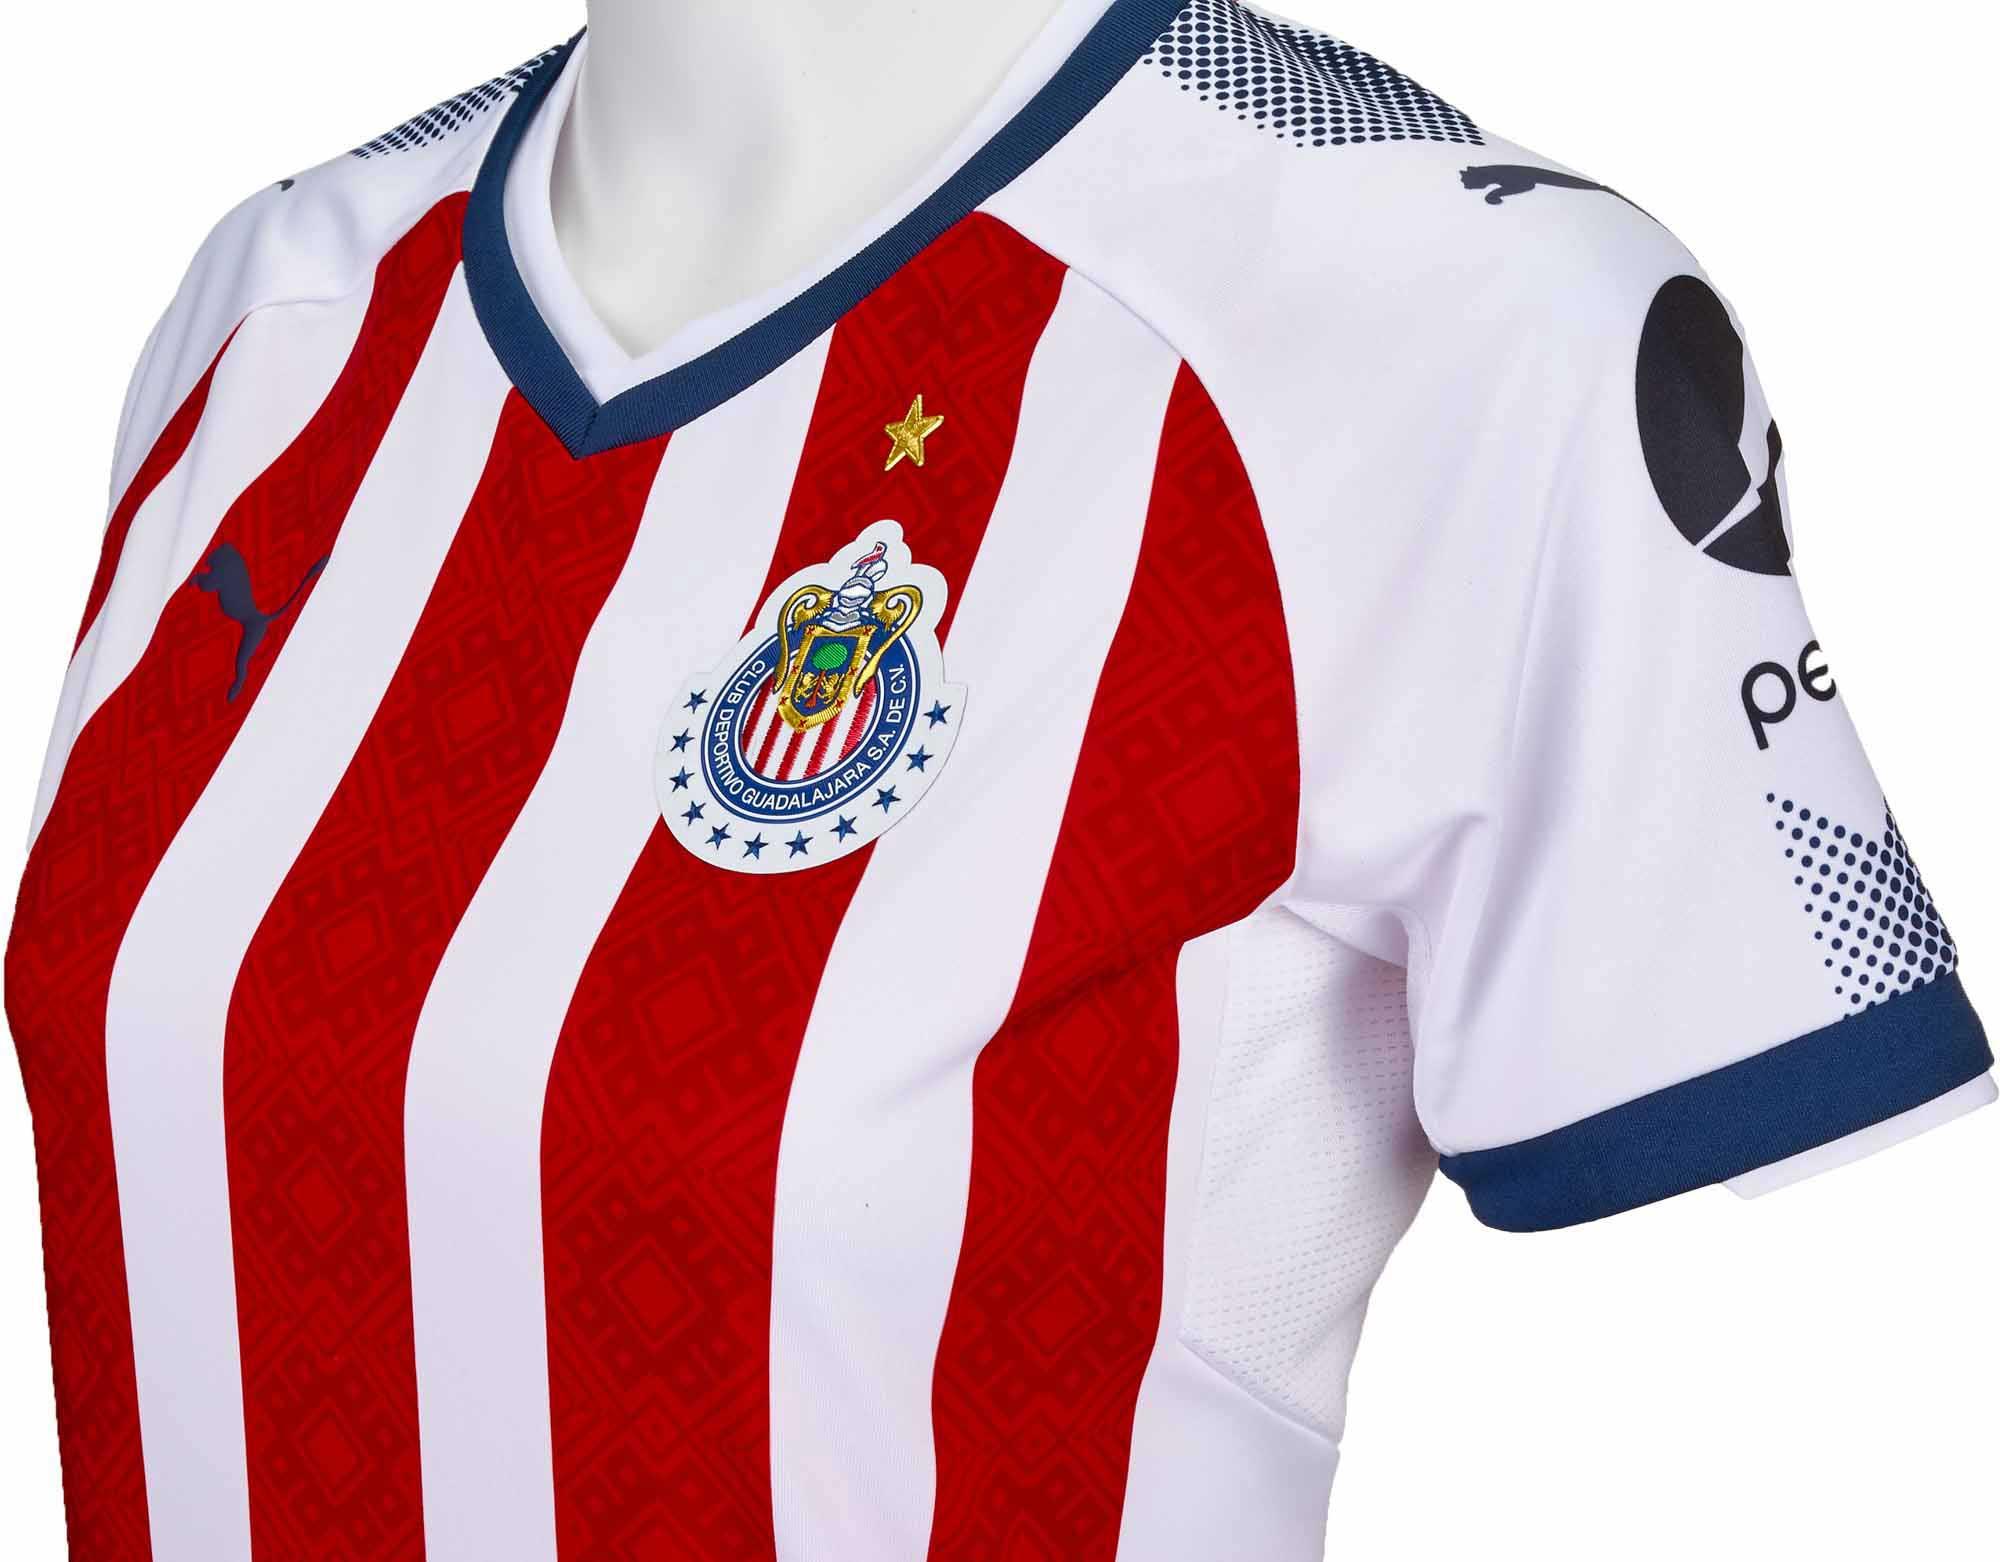 5923a4f0d 2017 18 Puma Womens Chivas Home Jersey - Soccer Master